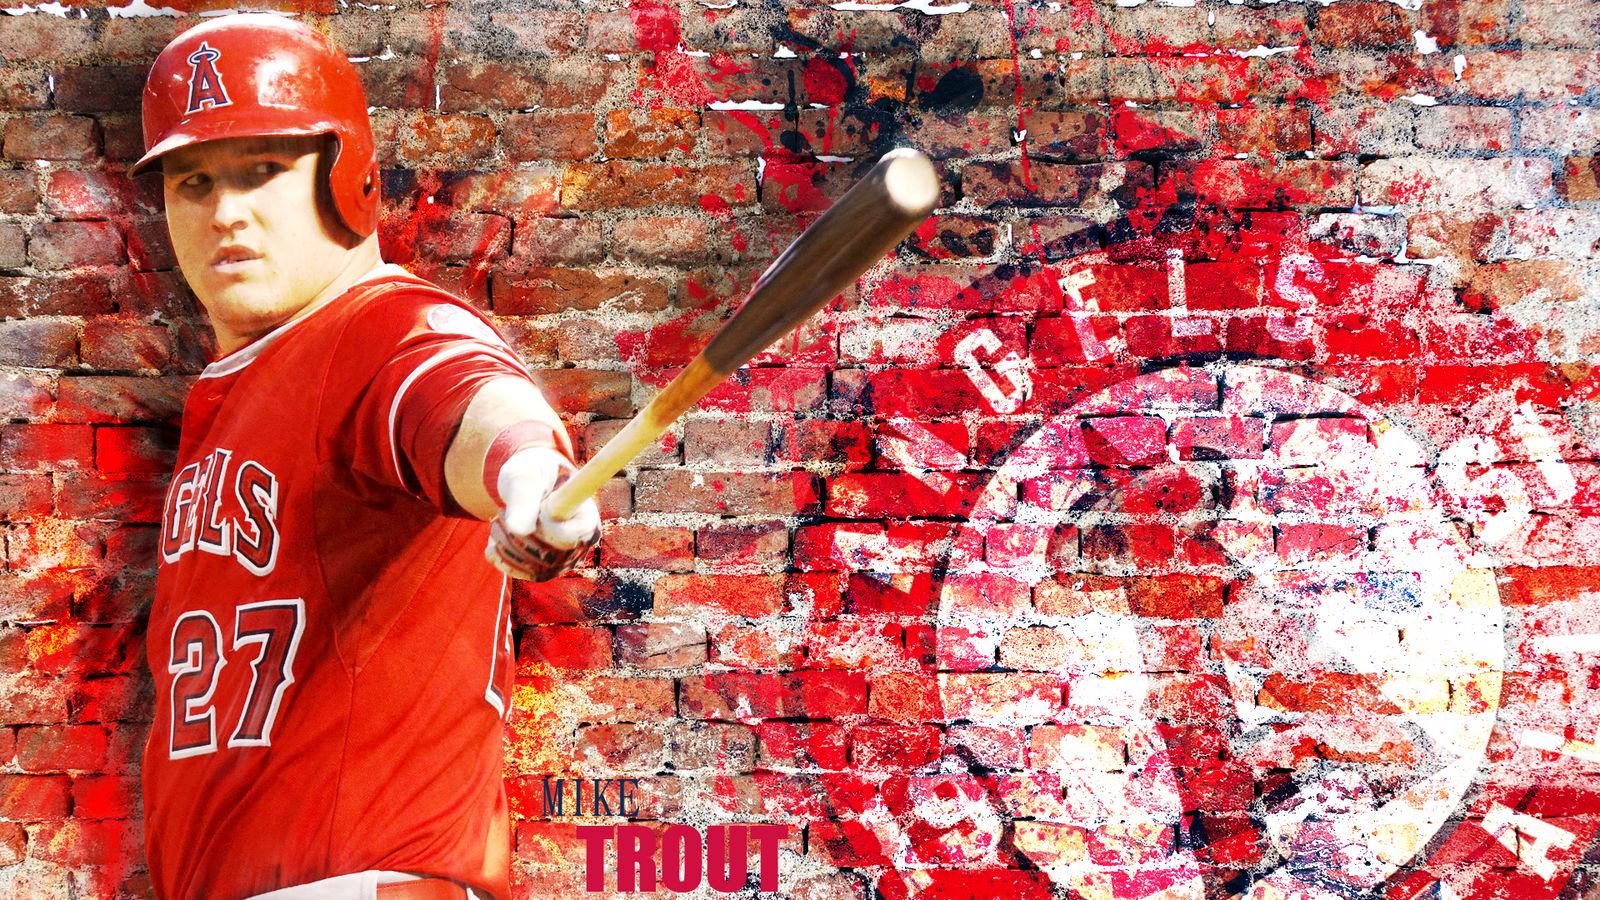 Mike Trout Wallpaper By Tennisball22 On Deviantart